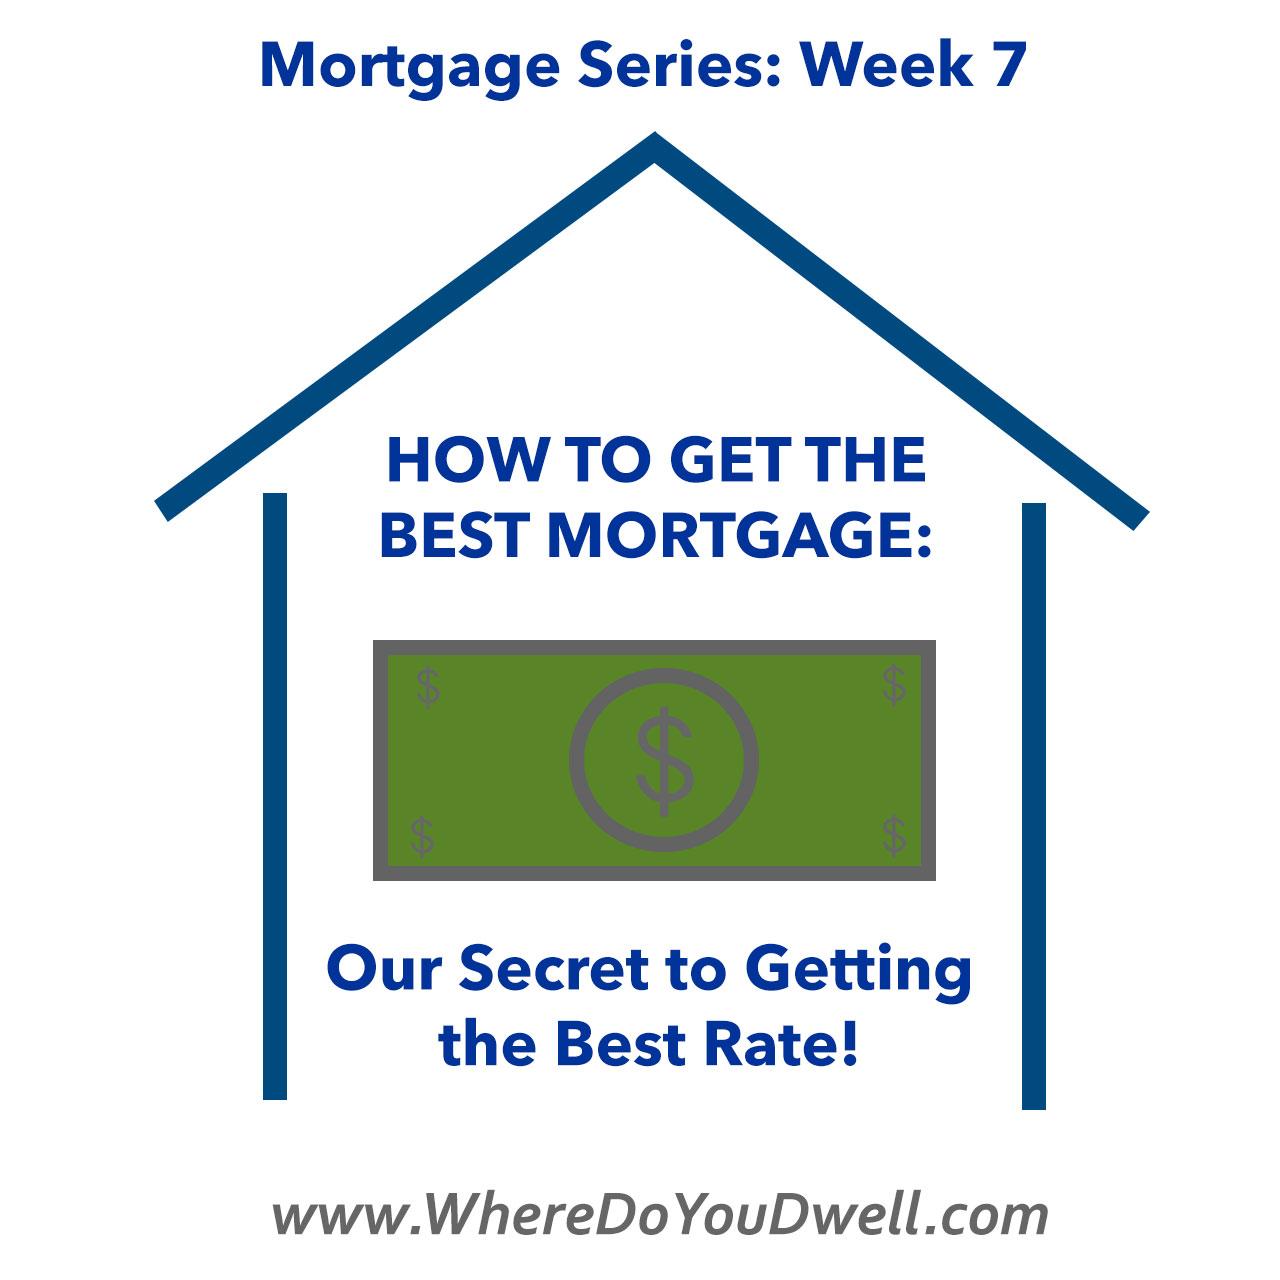 mortgageSeriesWeek7